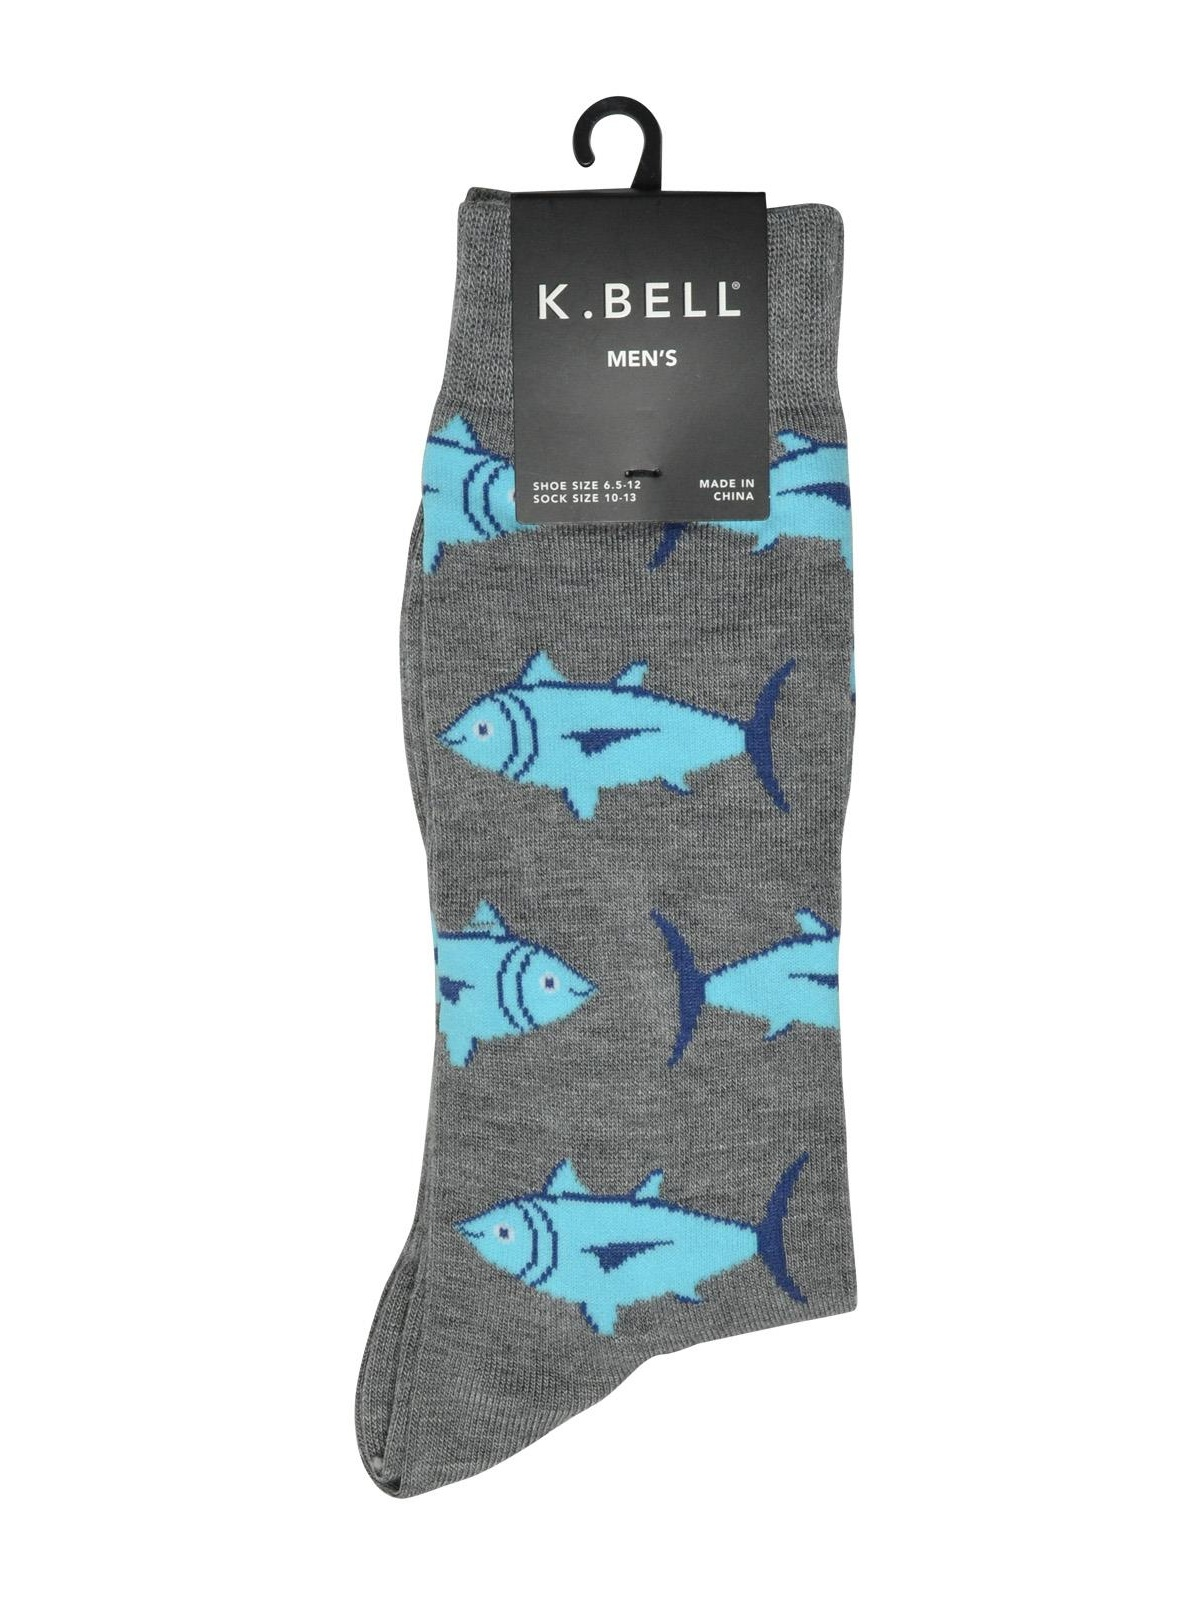 K.Bell Brown Black Leopard Print Sneaker Design Black Gray Crew Socks New